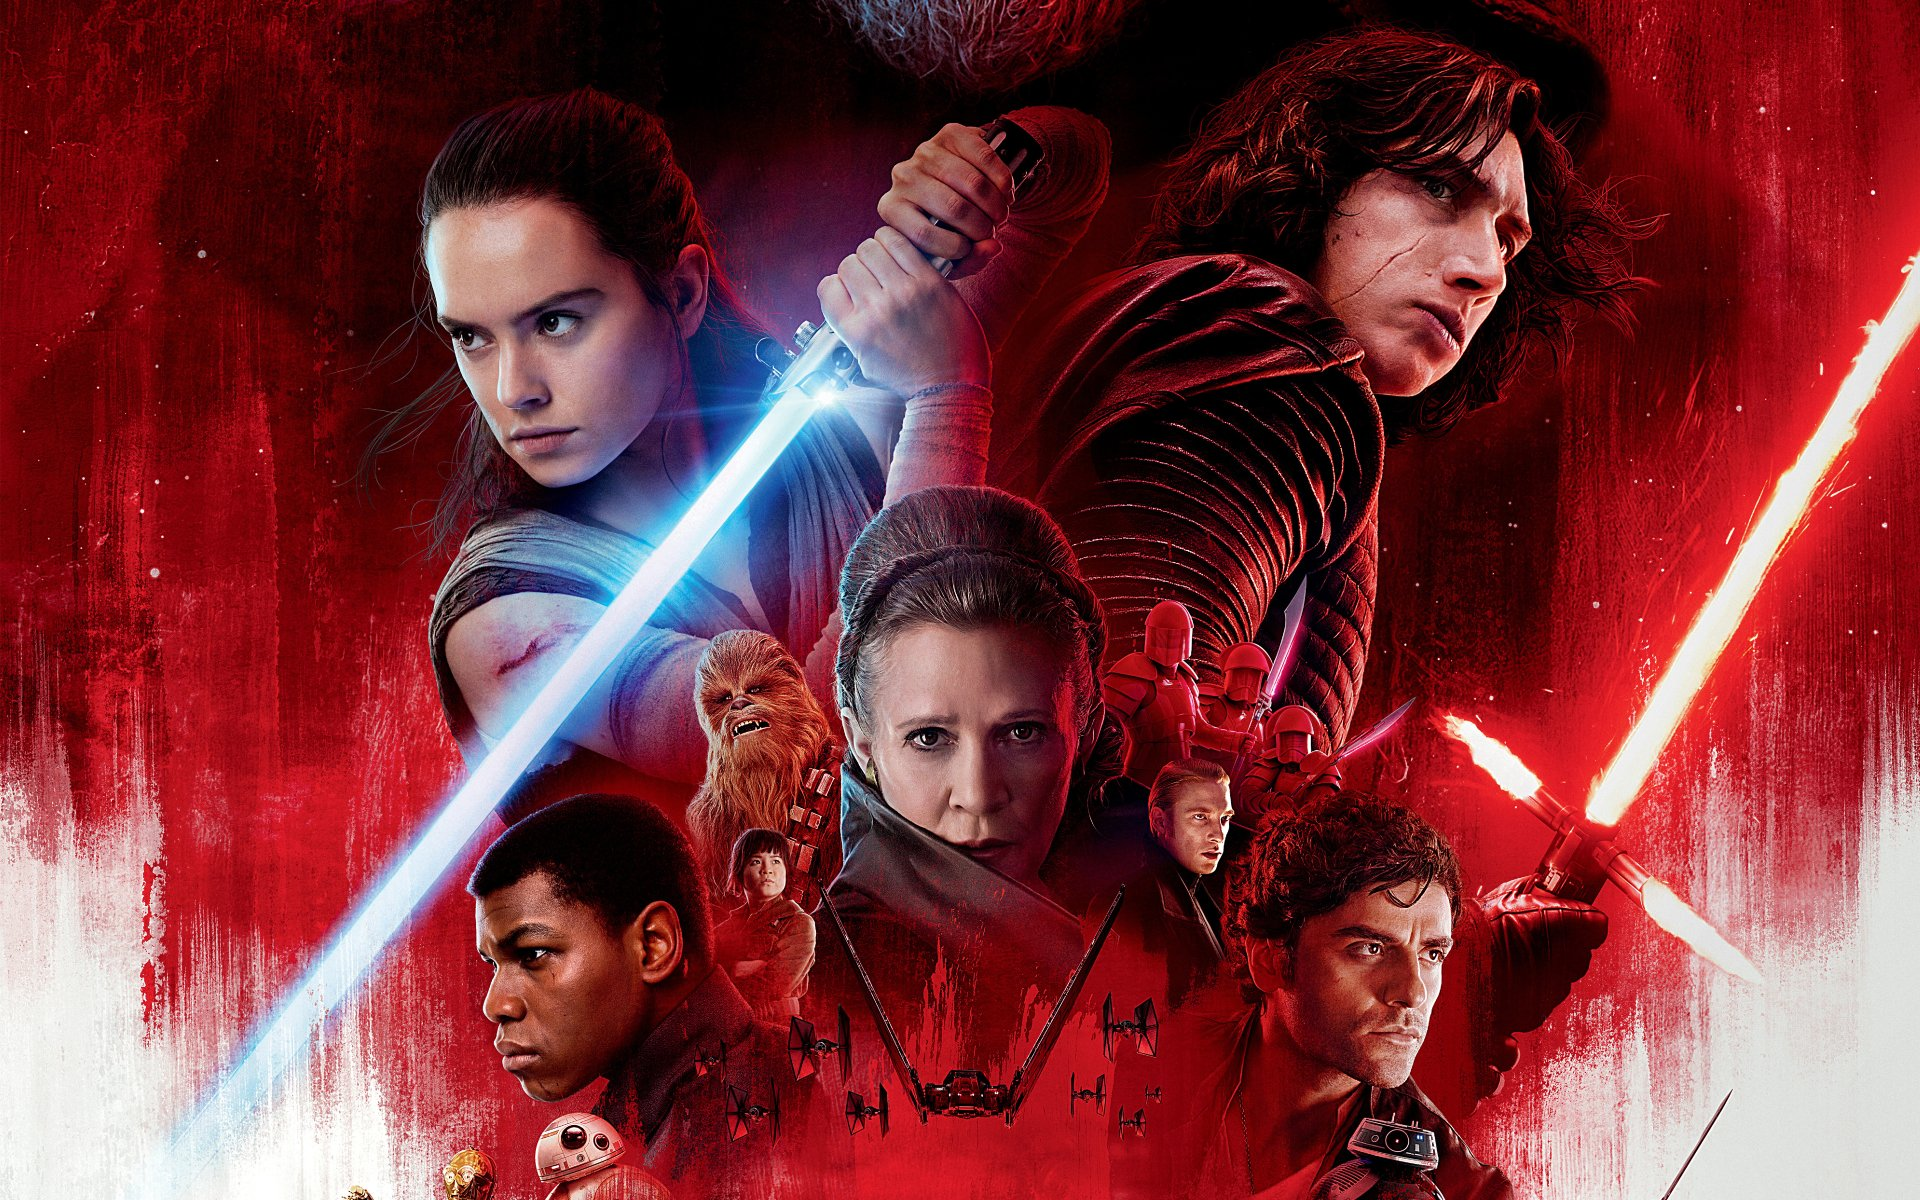 Movie - Star Wars: The Last Jedi  Star Wars Rey (Star Wars) Daisy Ridley Finn (Star Wars) John Boyega Carrie Fisher Leia Organa Adam Driver Kylo Ren Chewbacca Lightsaber Poe Dameron Wallpaper